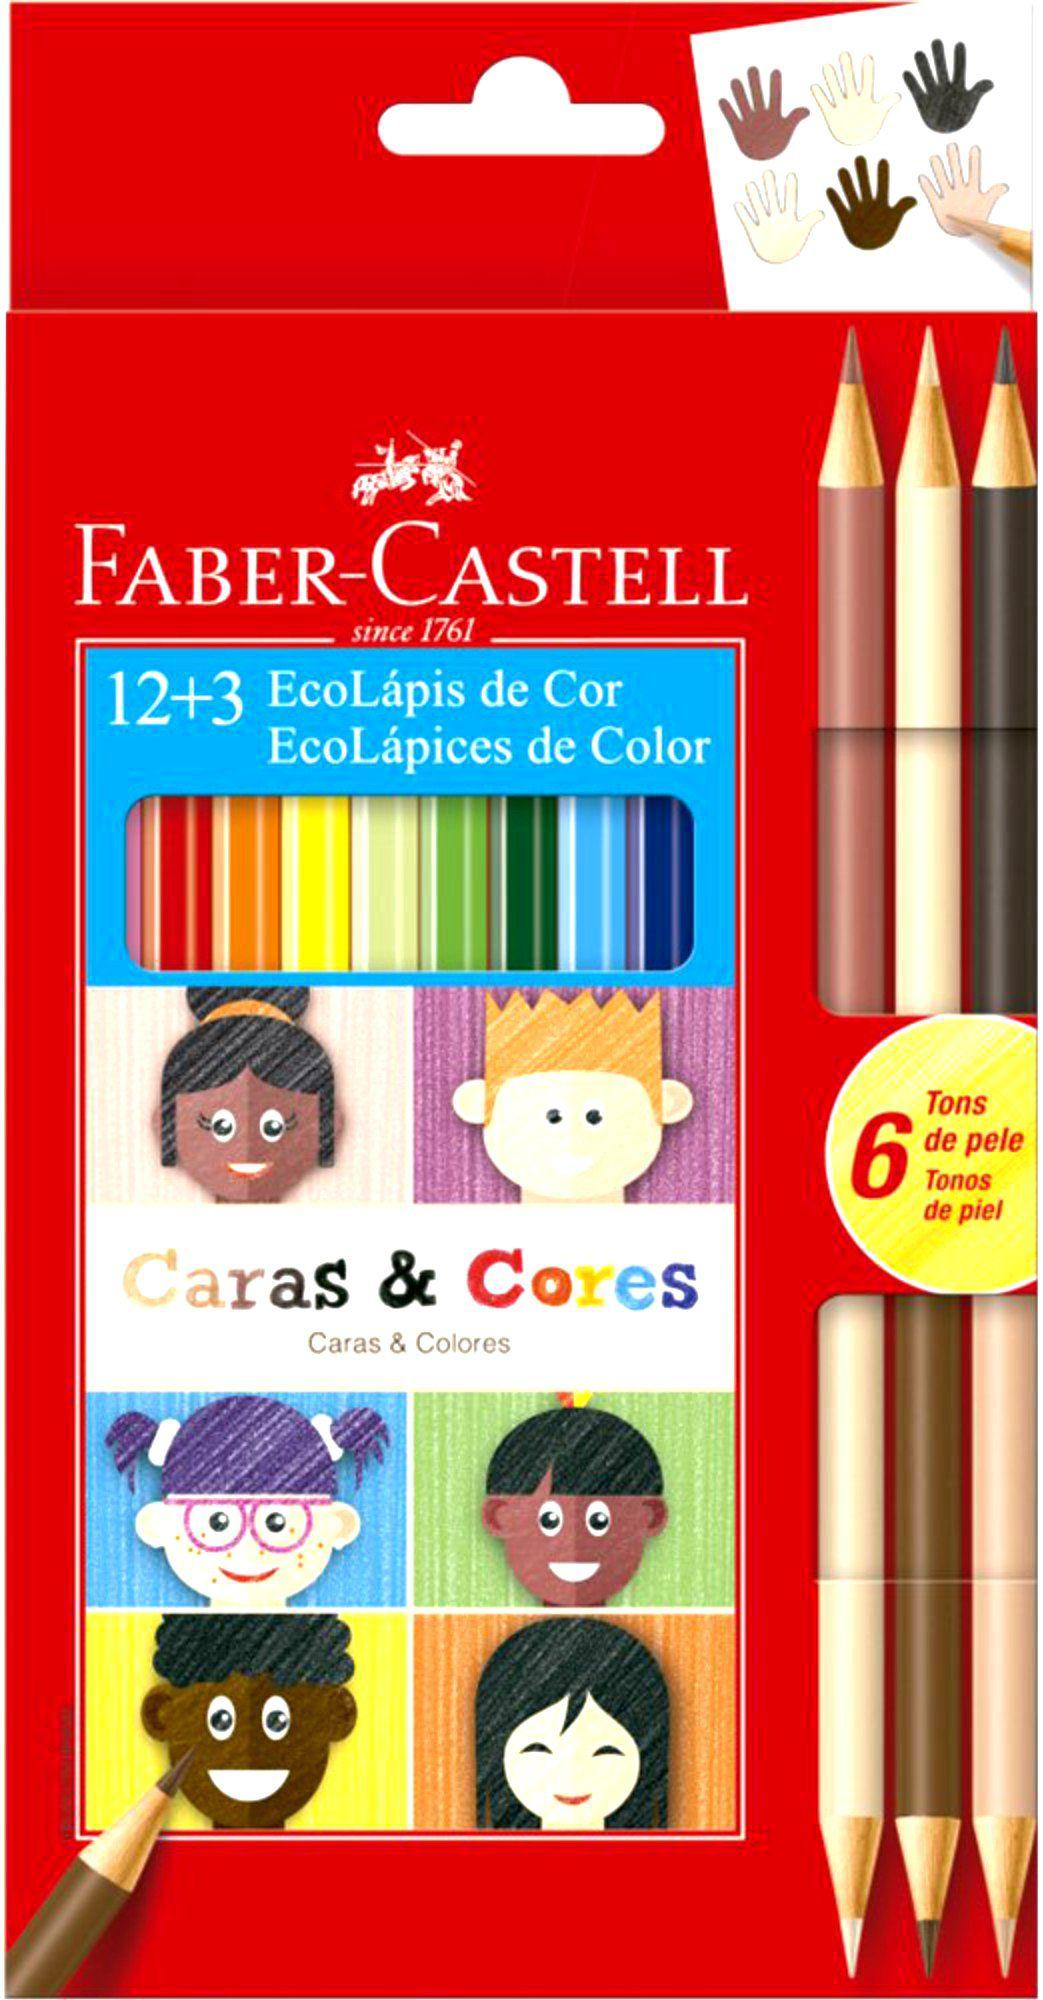 Lápis De Cor Faber Castell Caras e Cores 12 + 3